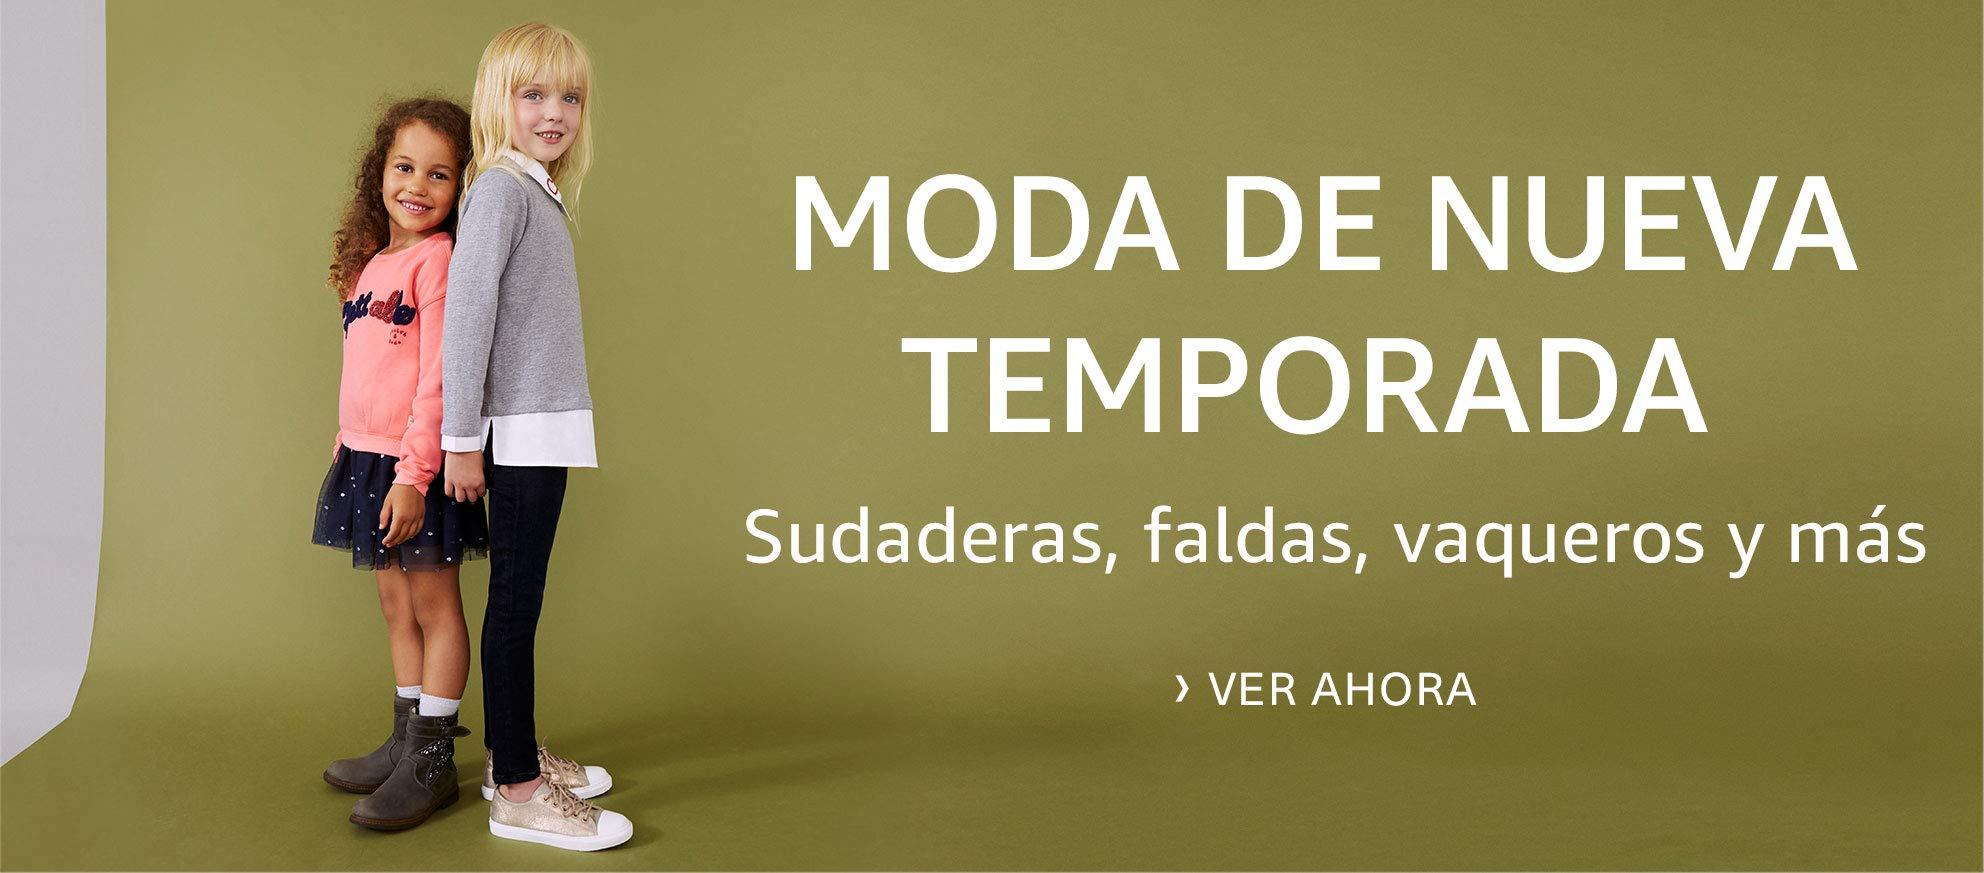 MODA DE NUEVA TEMPORADA